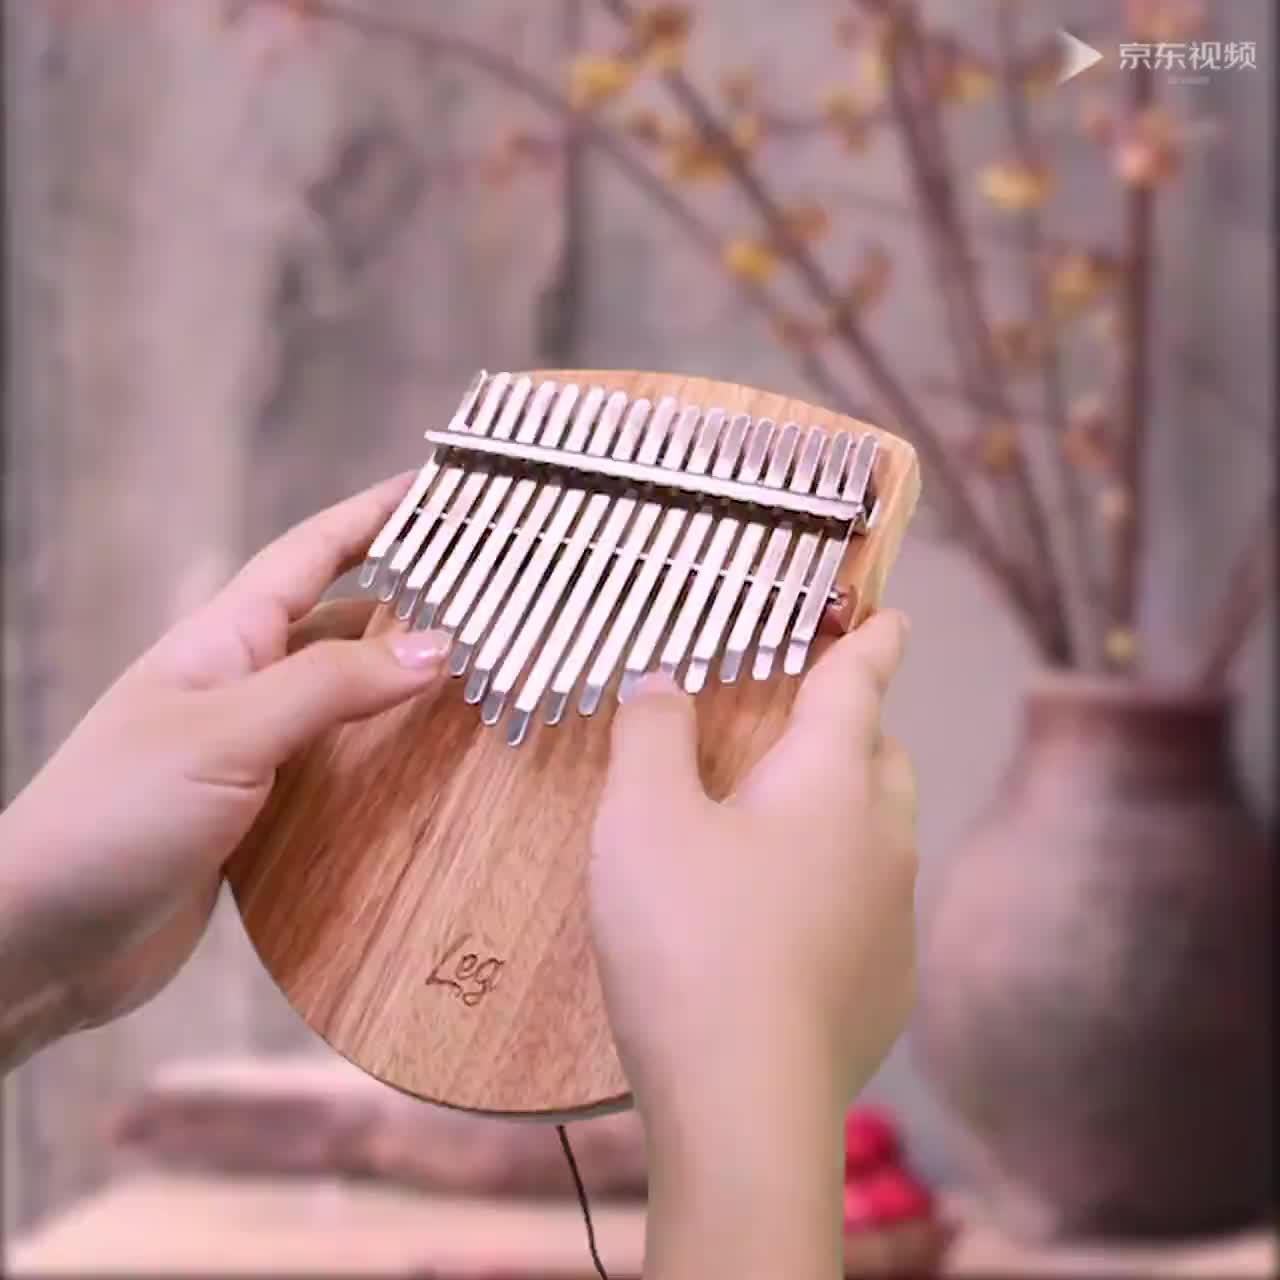 17 Note Key kalimba diy Vervanging Kit tool Mbira Duim Piano voor kinderen